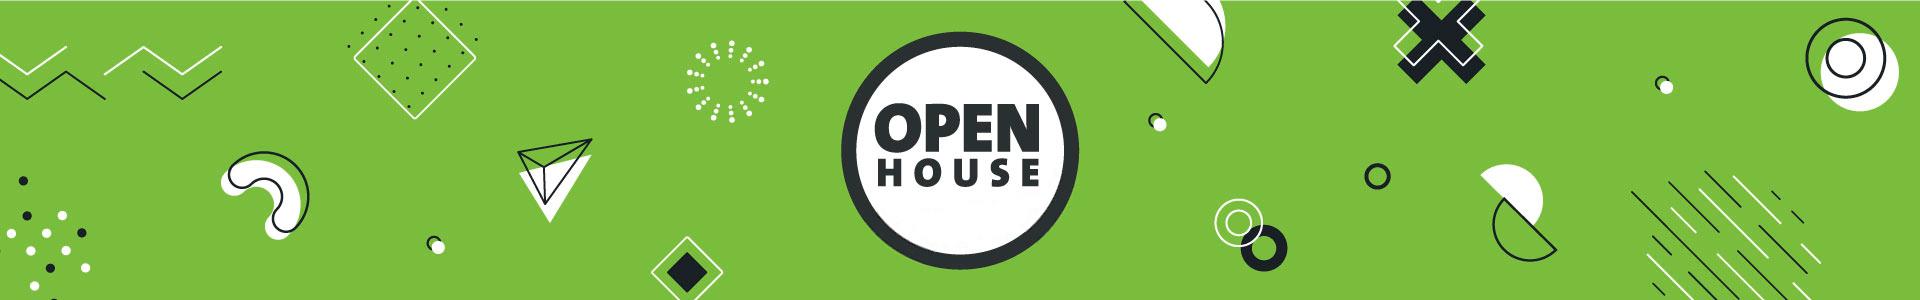 Open House - Universidad ORT Uruguay